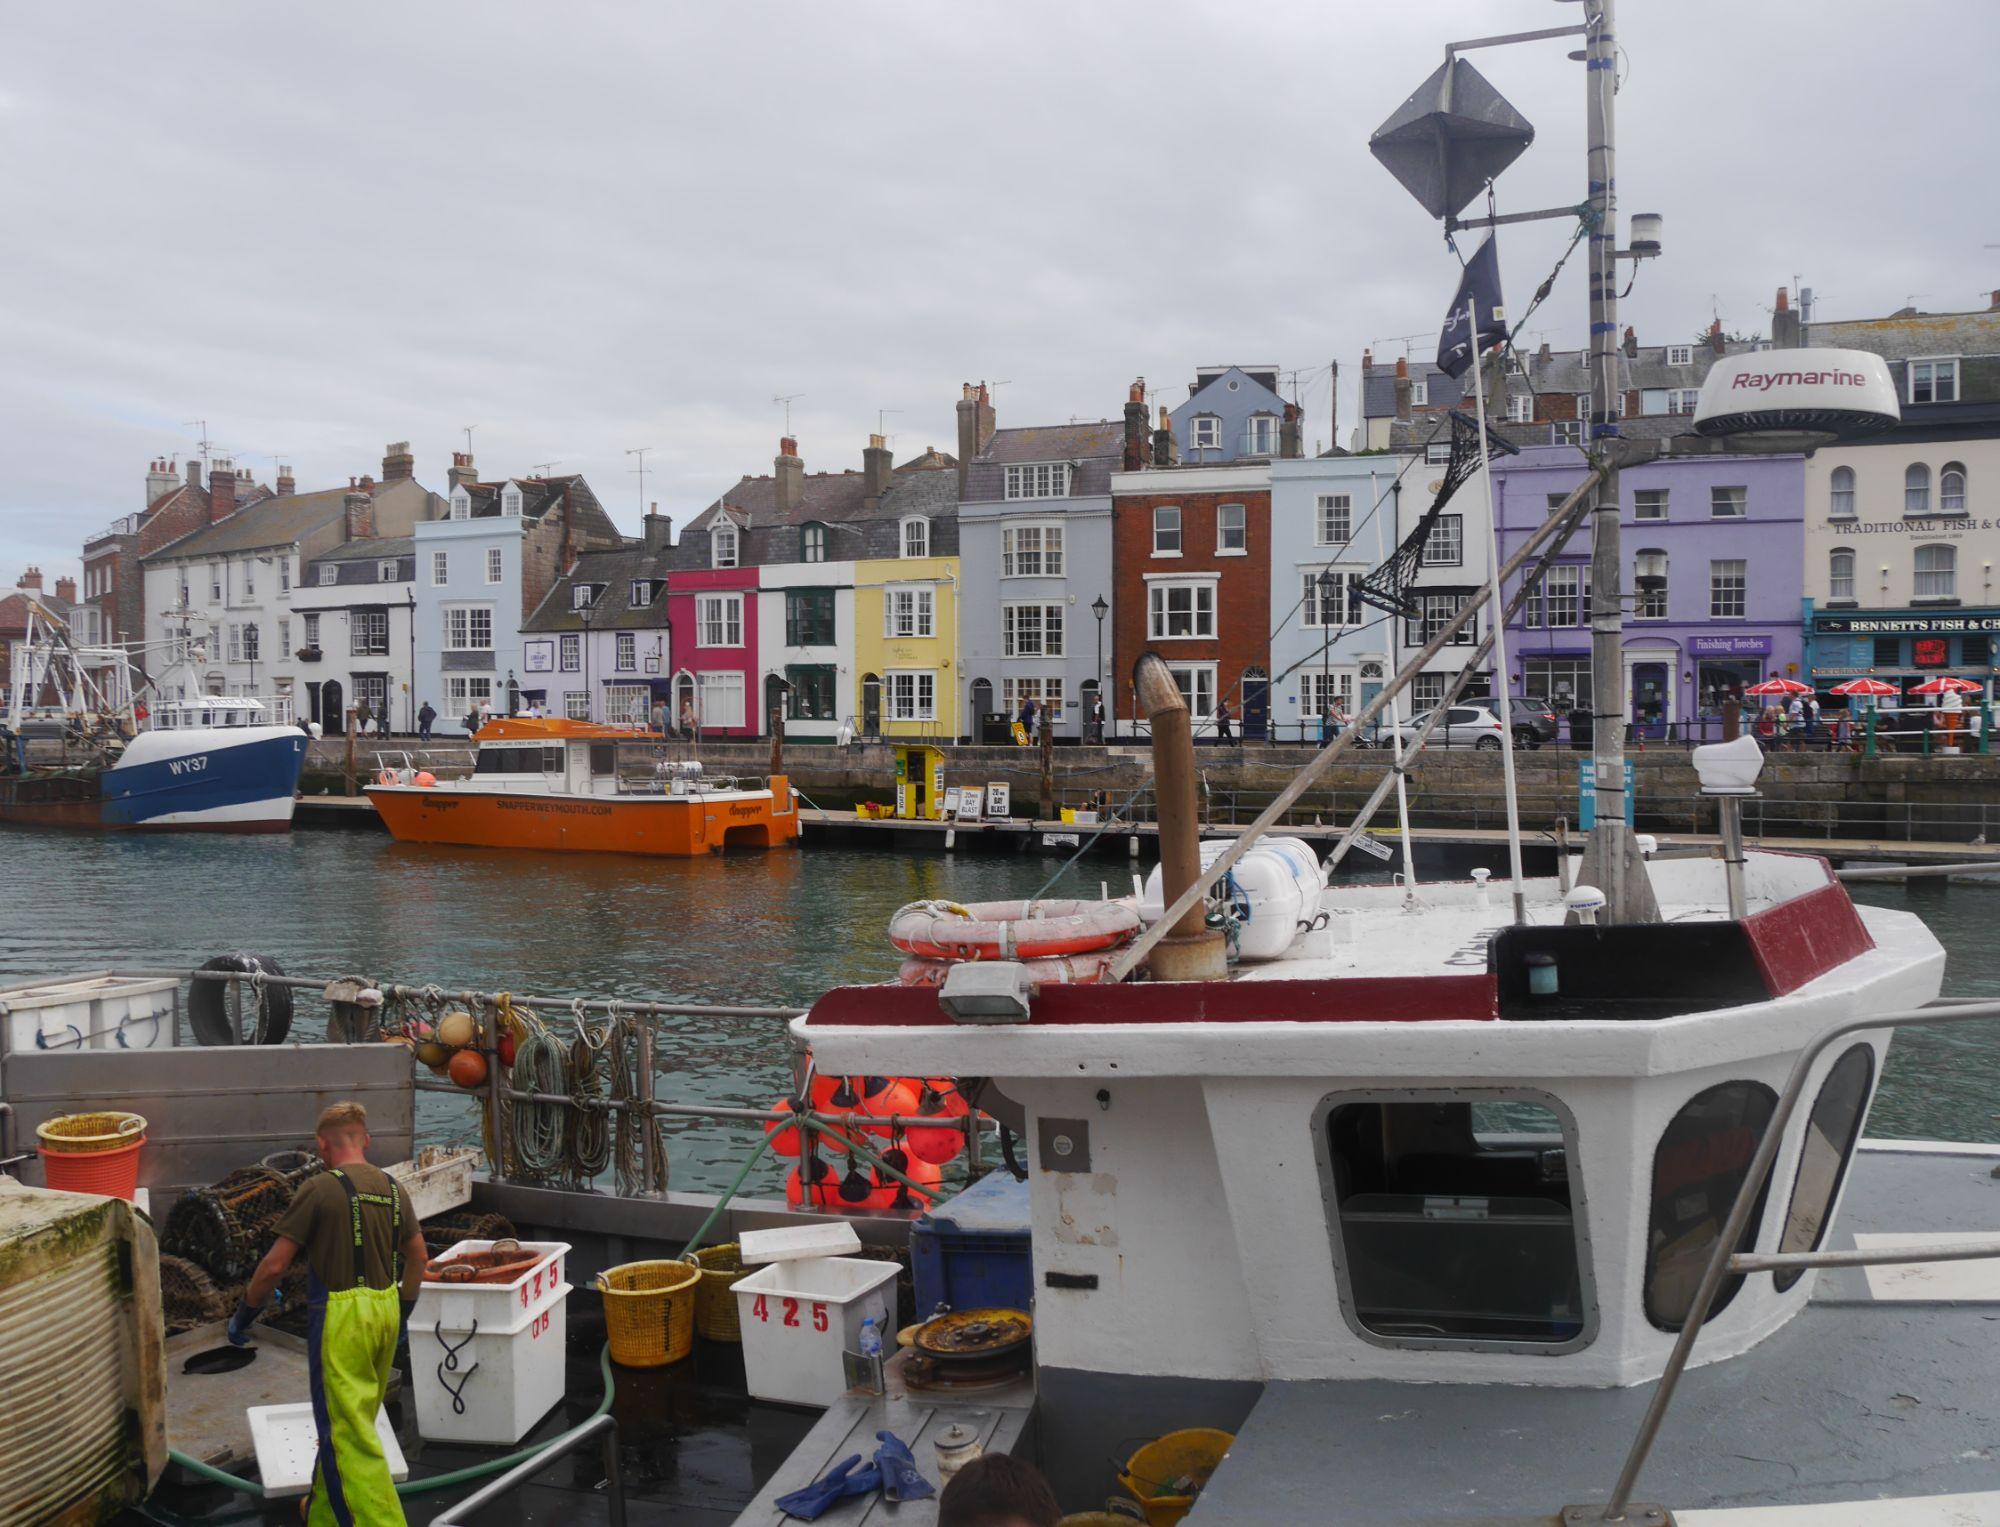 200904 Weymouth (74).jpg